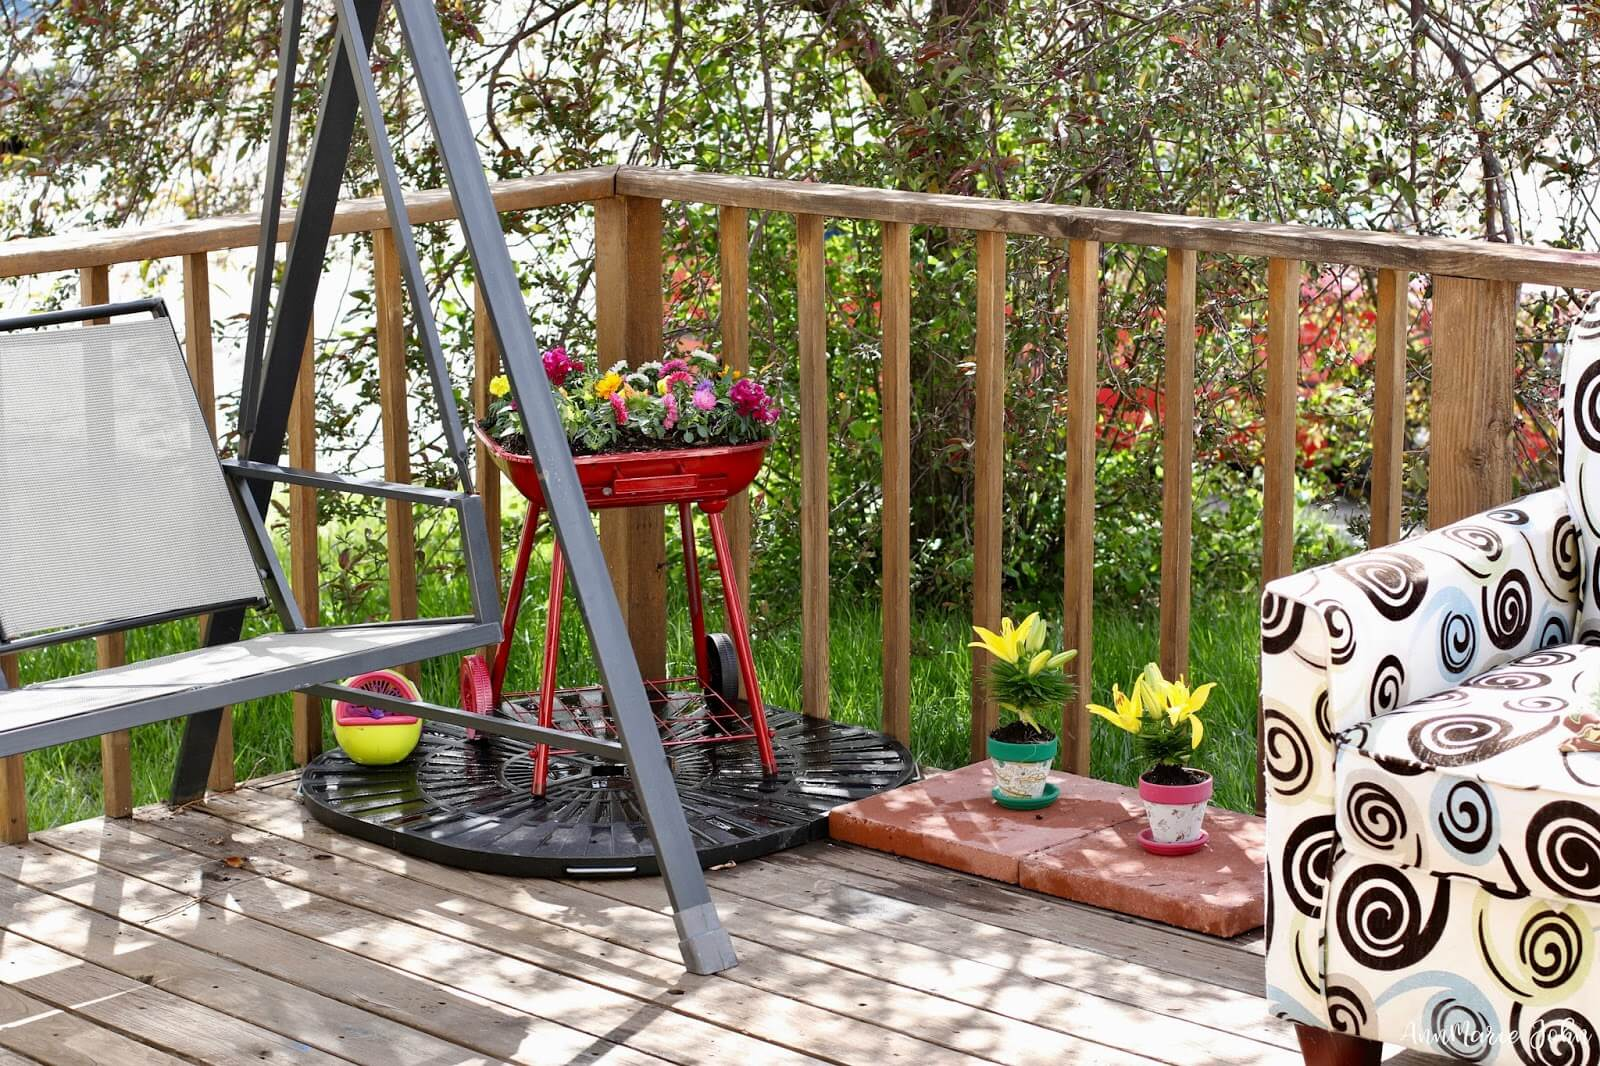 Grillin' Up Some Garden Goodness Yard Art Idea